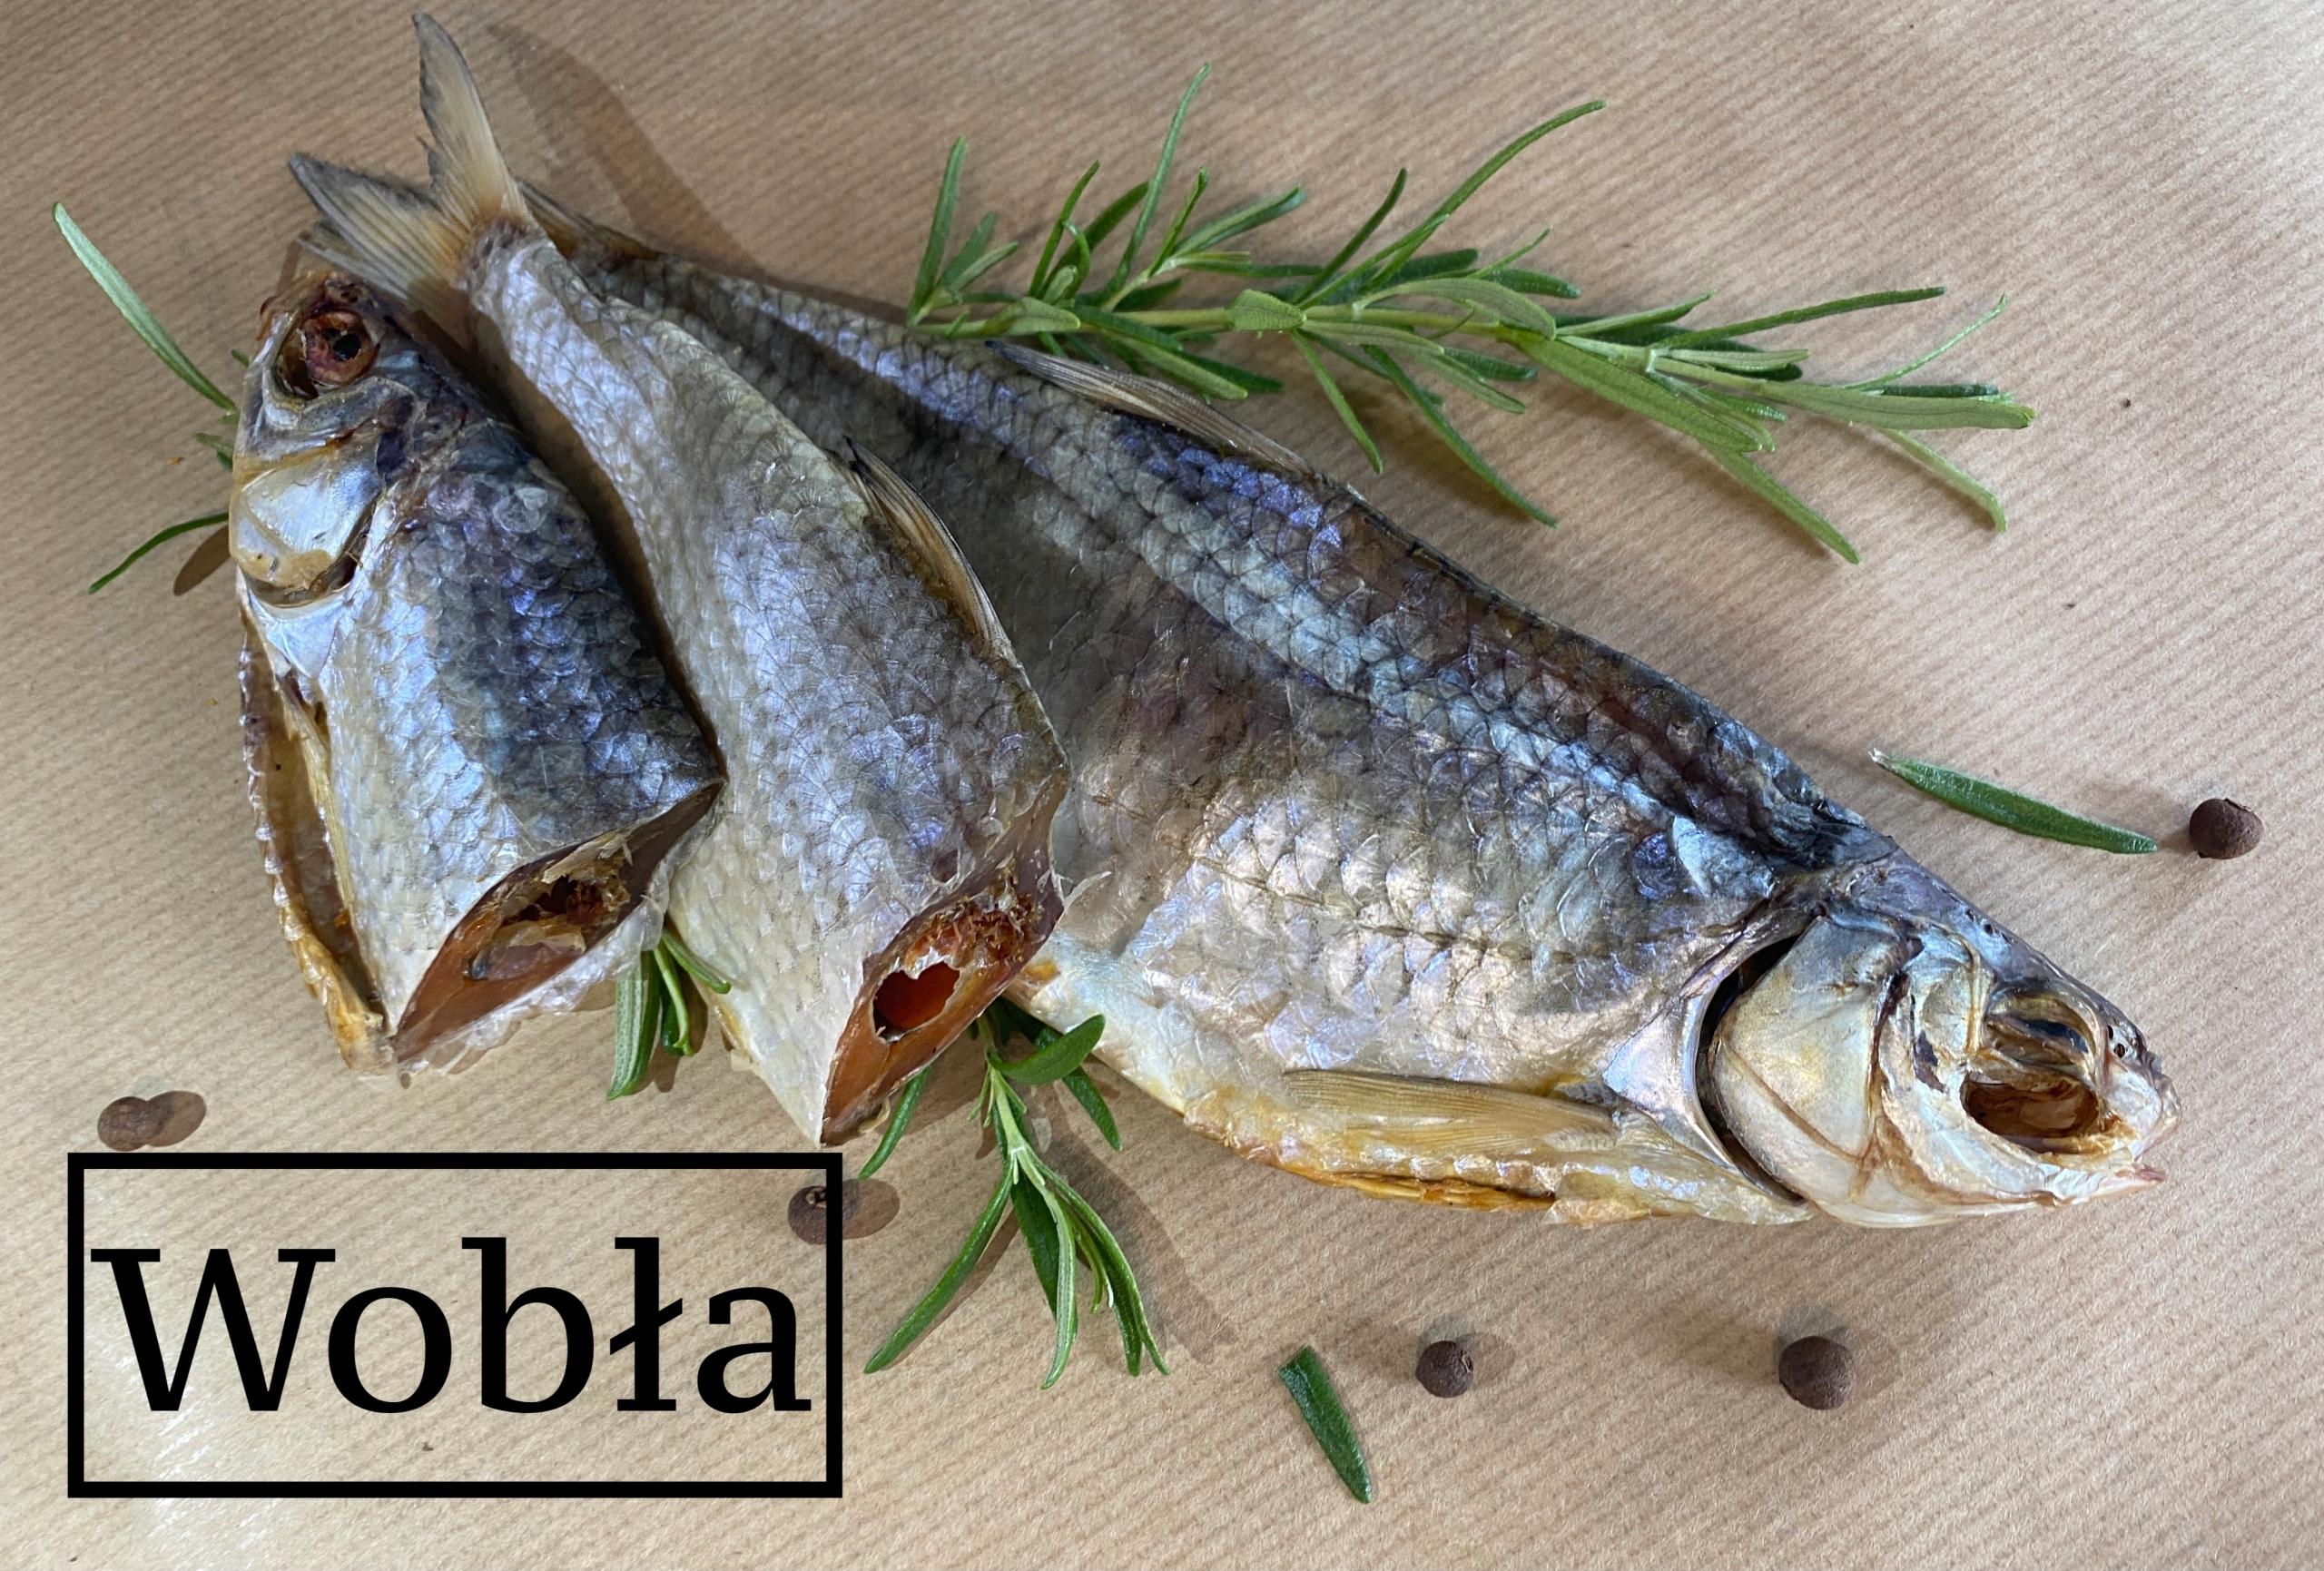 Вобла (каспийская плотва) Сушеная рыба 200 +/- 10 г x 25 шт.